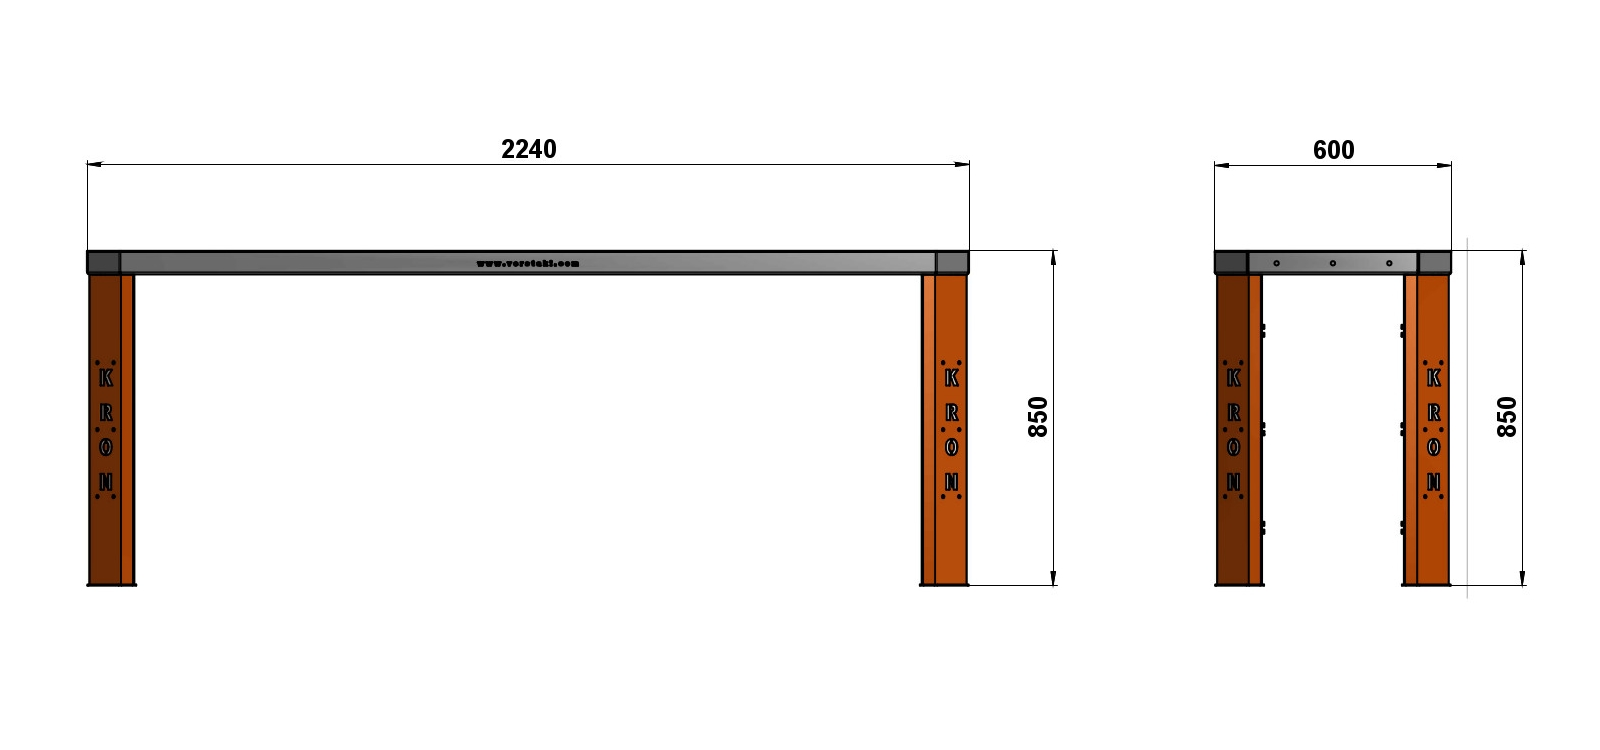 Чертеж слесарного верстака шириной 2240 мм без экрана